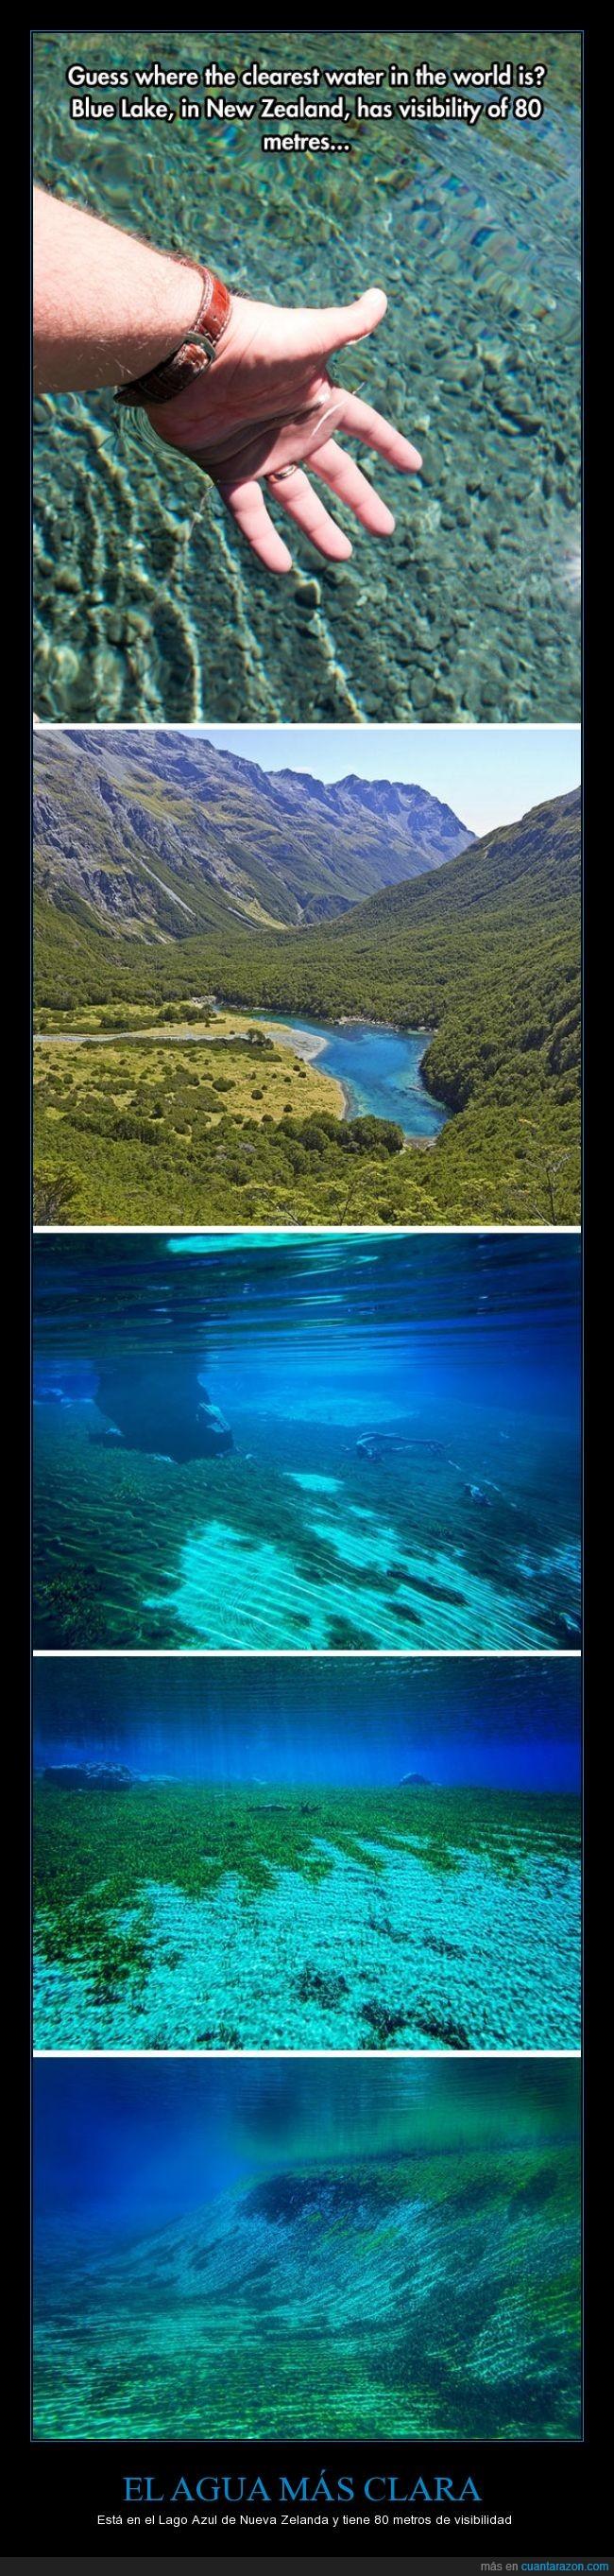 agua,clara,Lago Azul,nueva zelanda,transparente,visibilidad